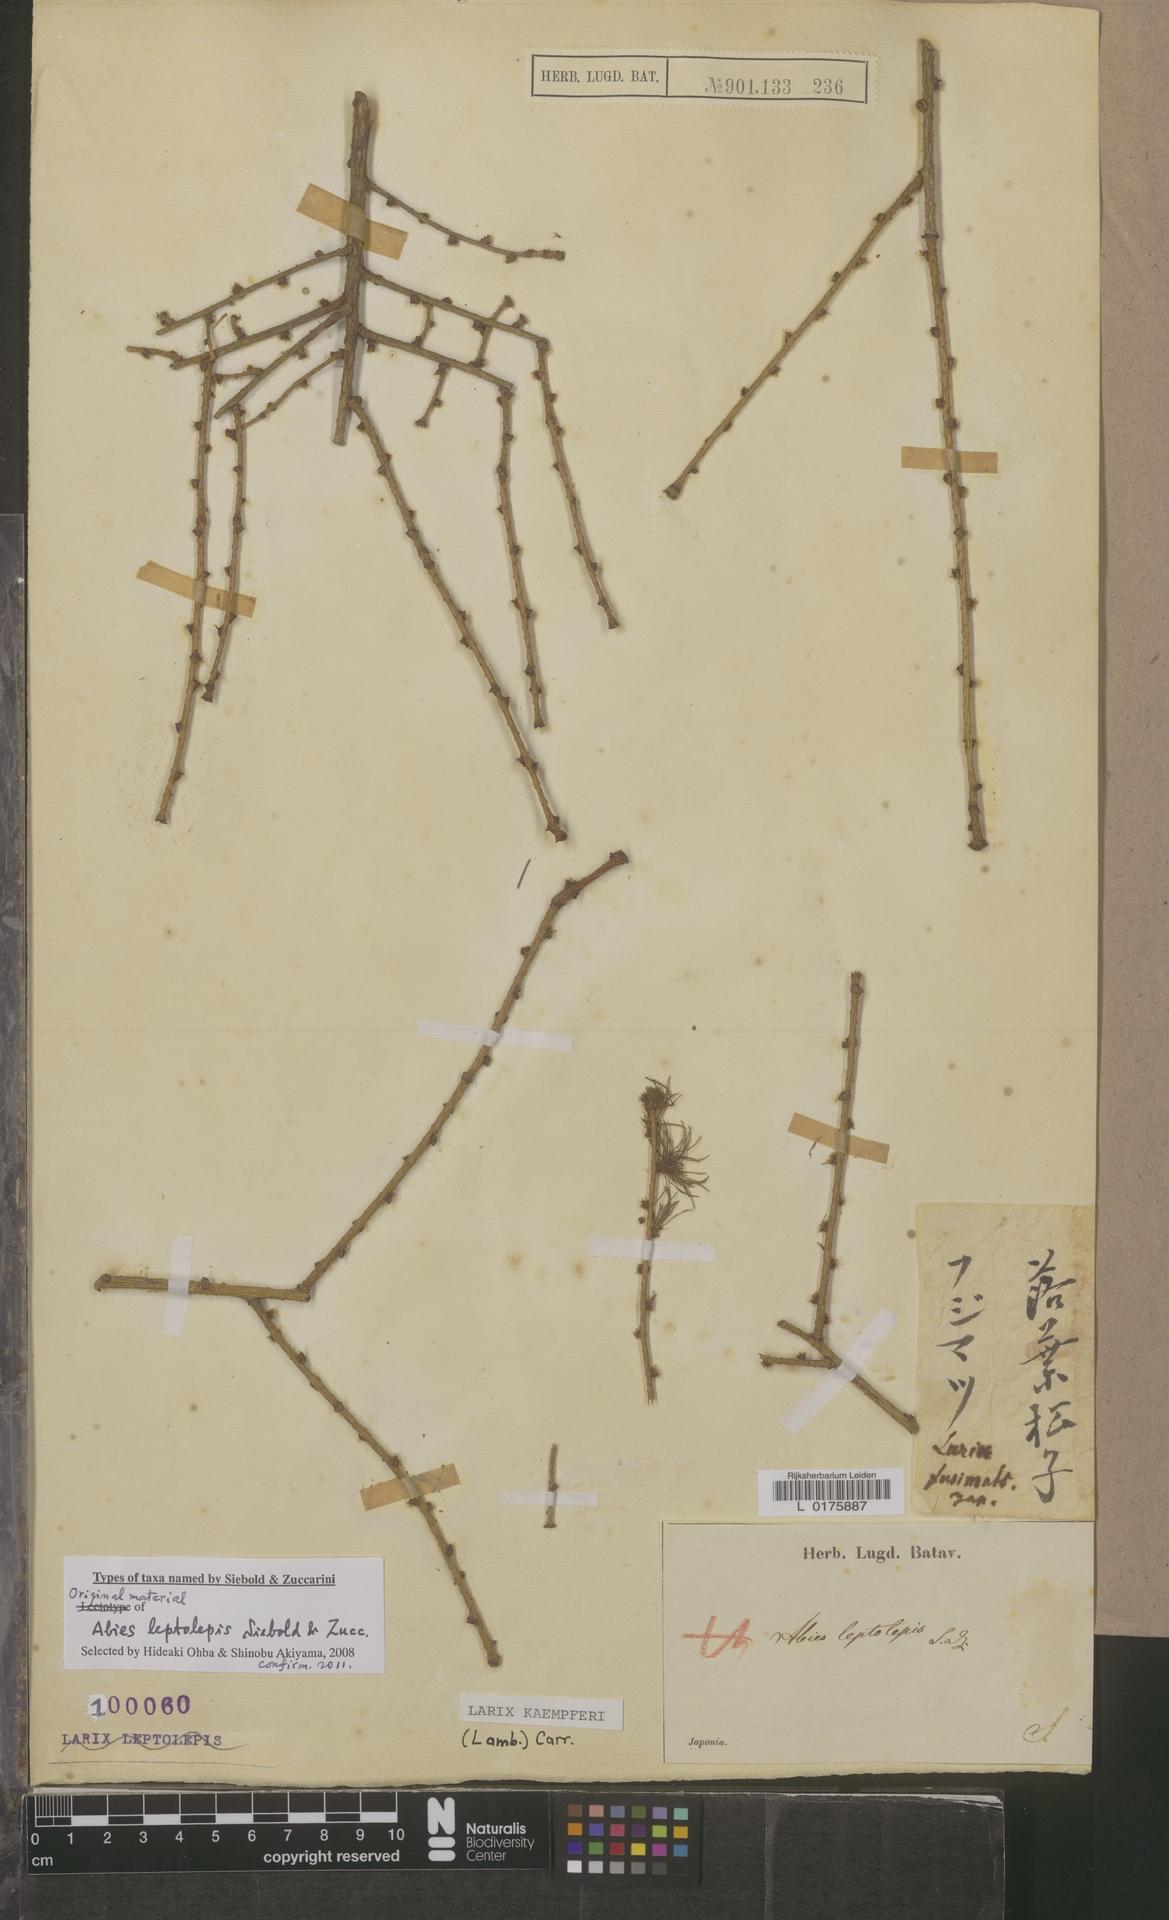 L  0175887 | Larix kaempferi (Lamb.) Carrière